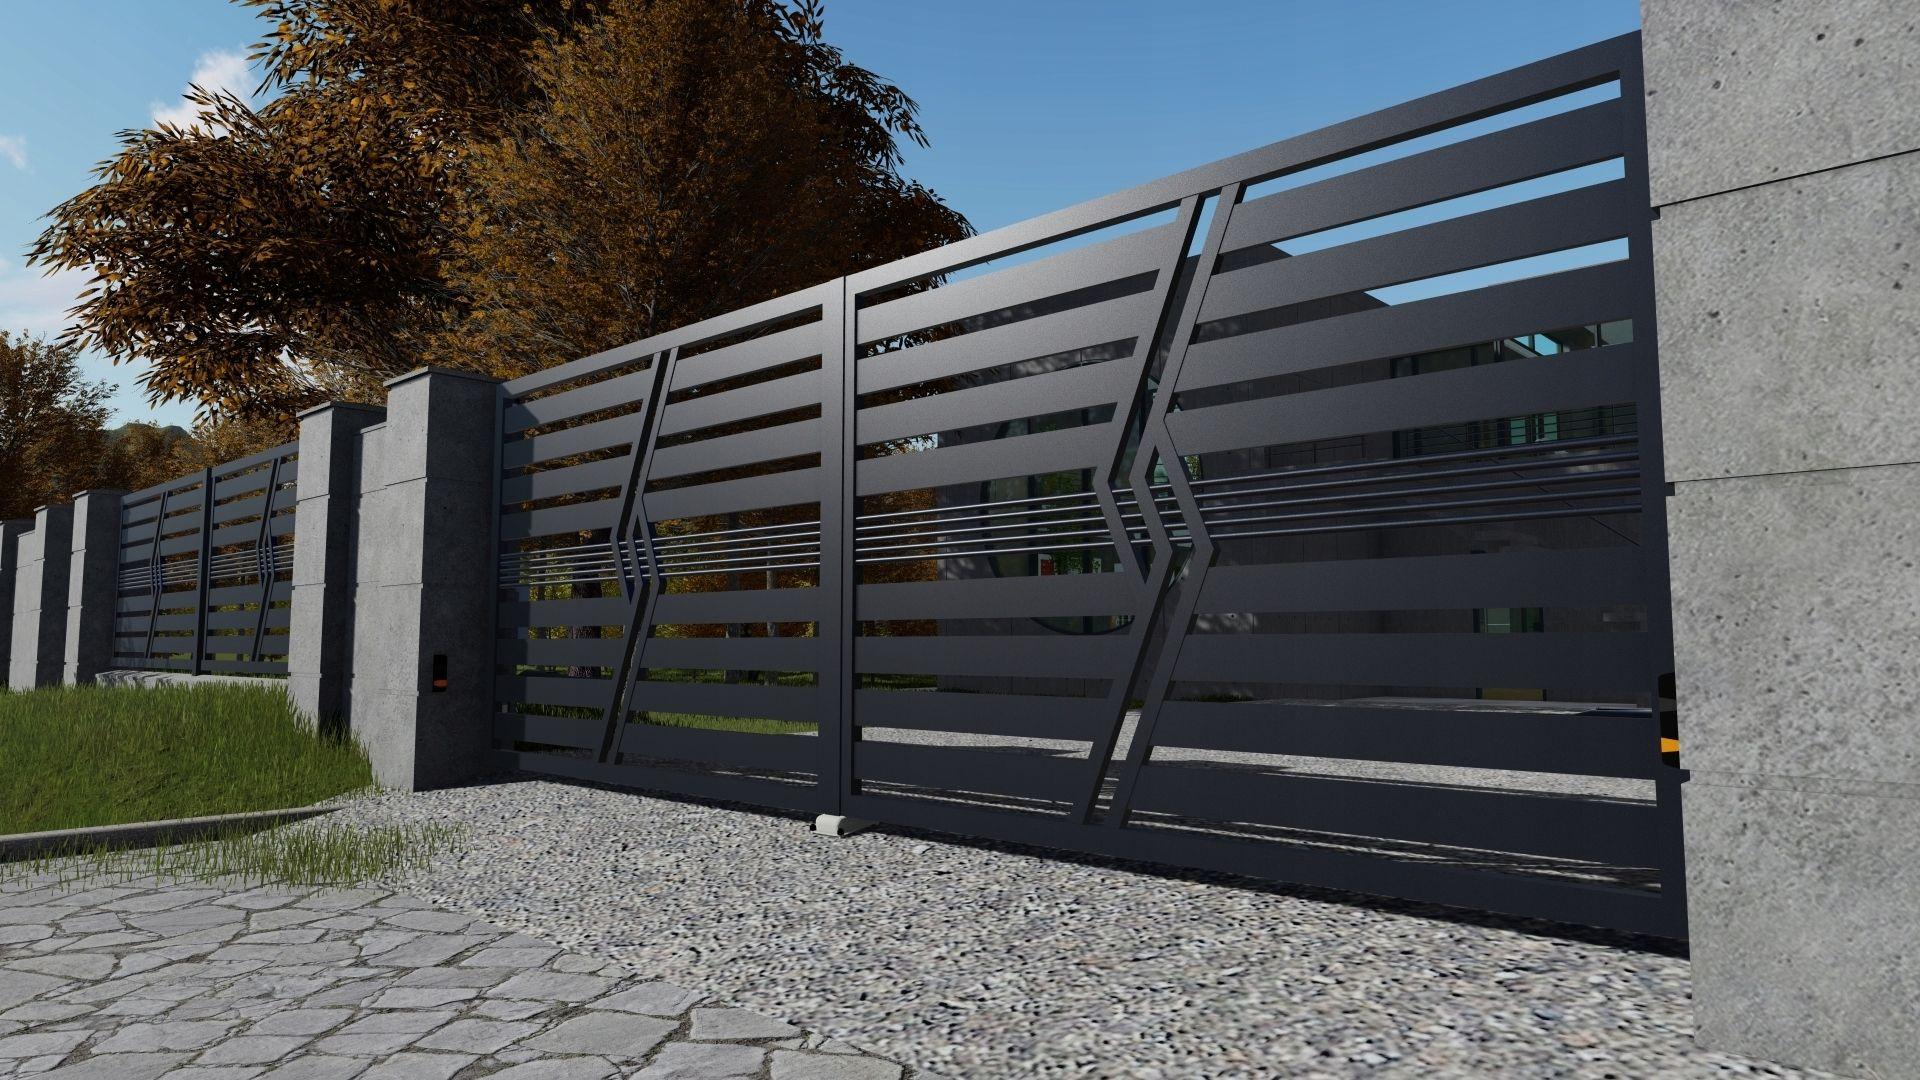 Nowoczesne Ogrodzenia Panelowe Ploty 369 8818440540 Allegro Pl Entrance Gates Design Gate Design House Gate Design